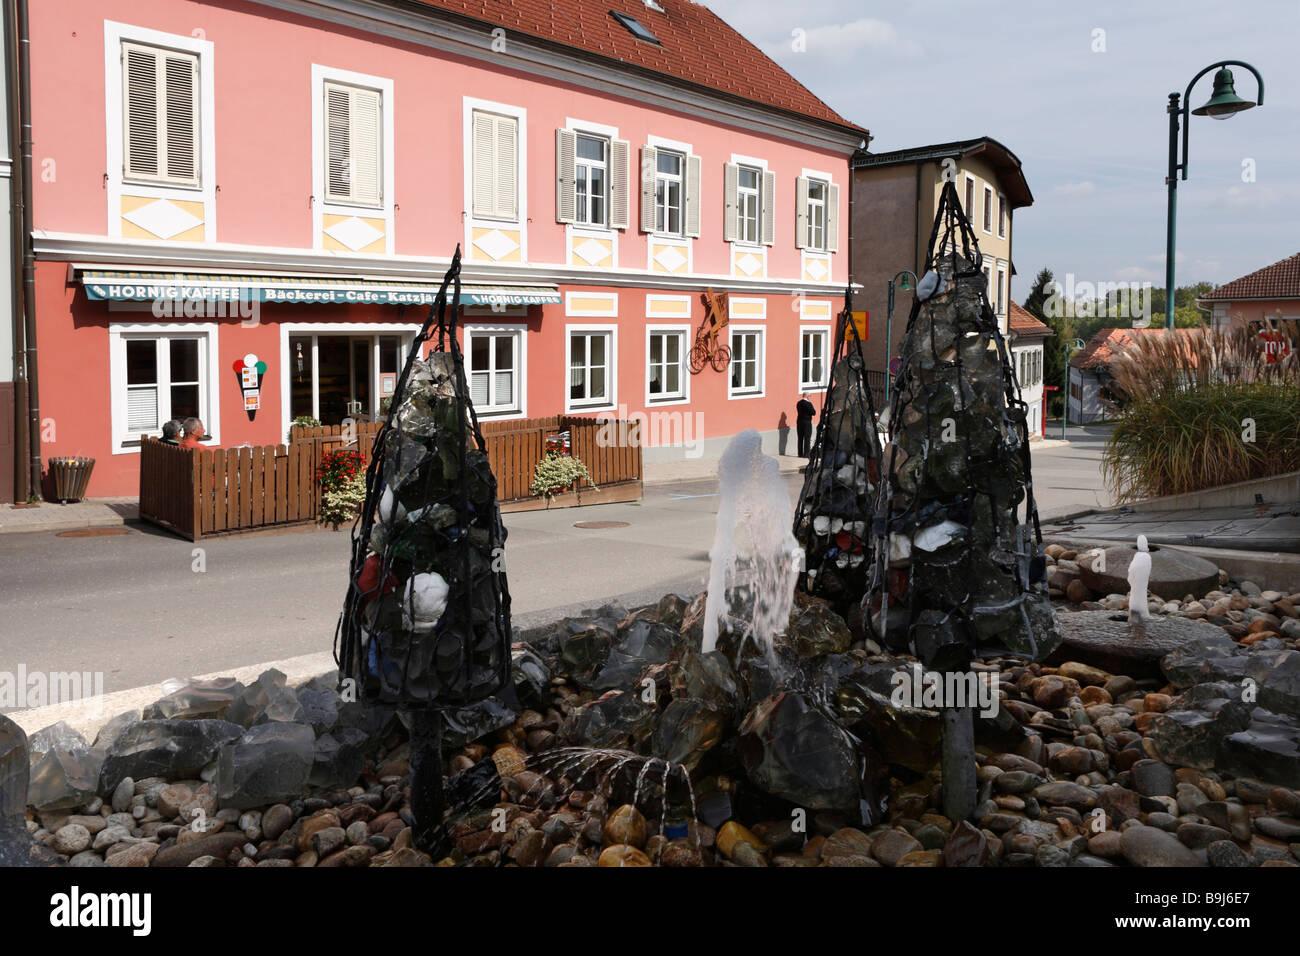 Industrial fountain by Peter Brauchart, Eibiswald, Styria, Austria, Europe - Stock Image